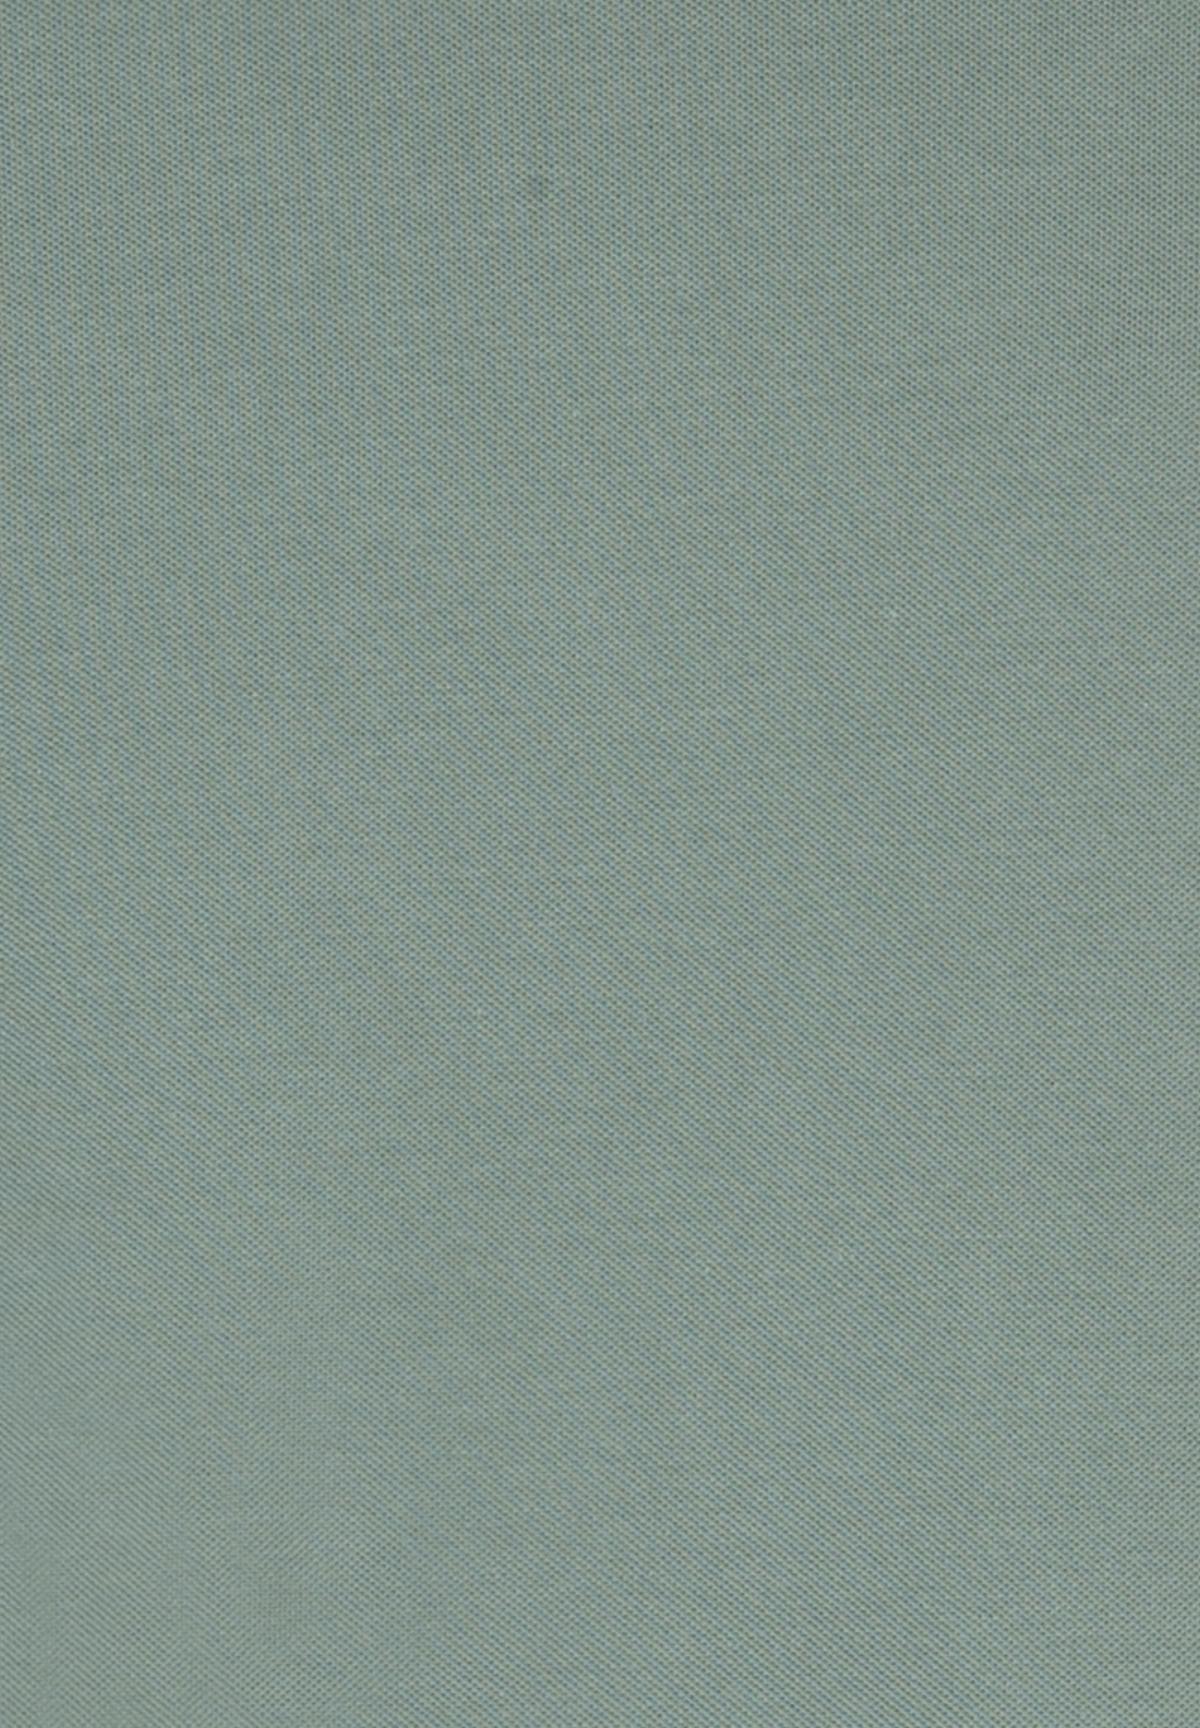 Camel-Active-Herren-Shirt-Poloshirt-Pique-Regular-Fit-NEU Indexbild 91